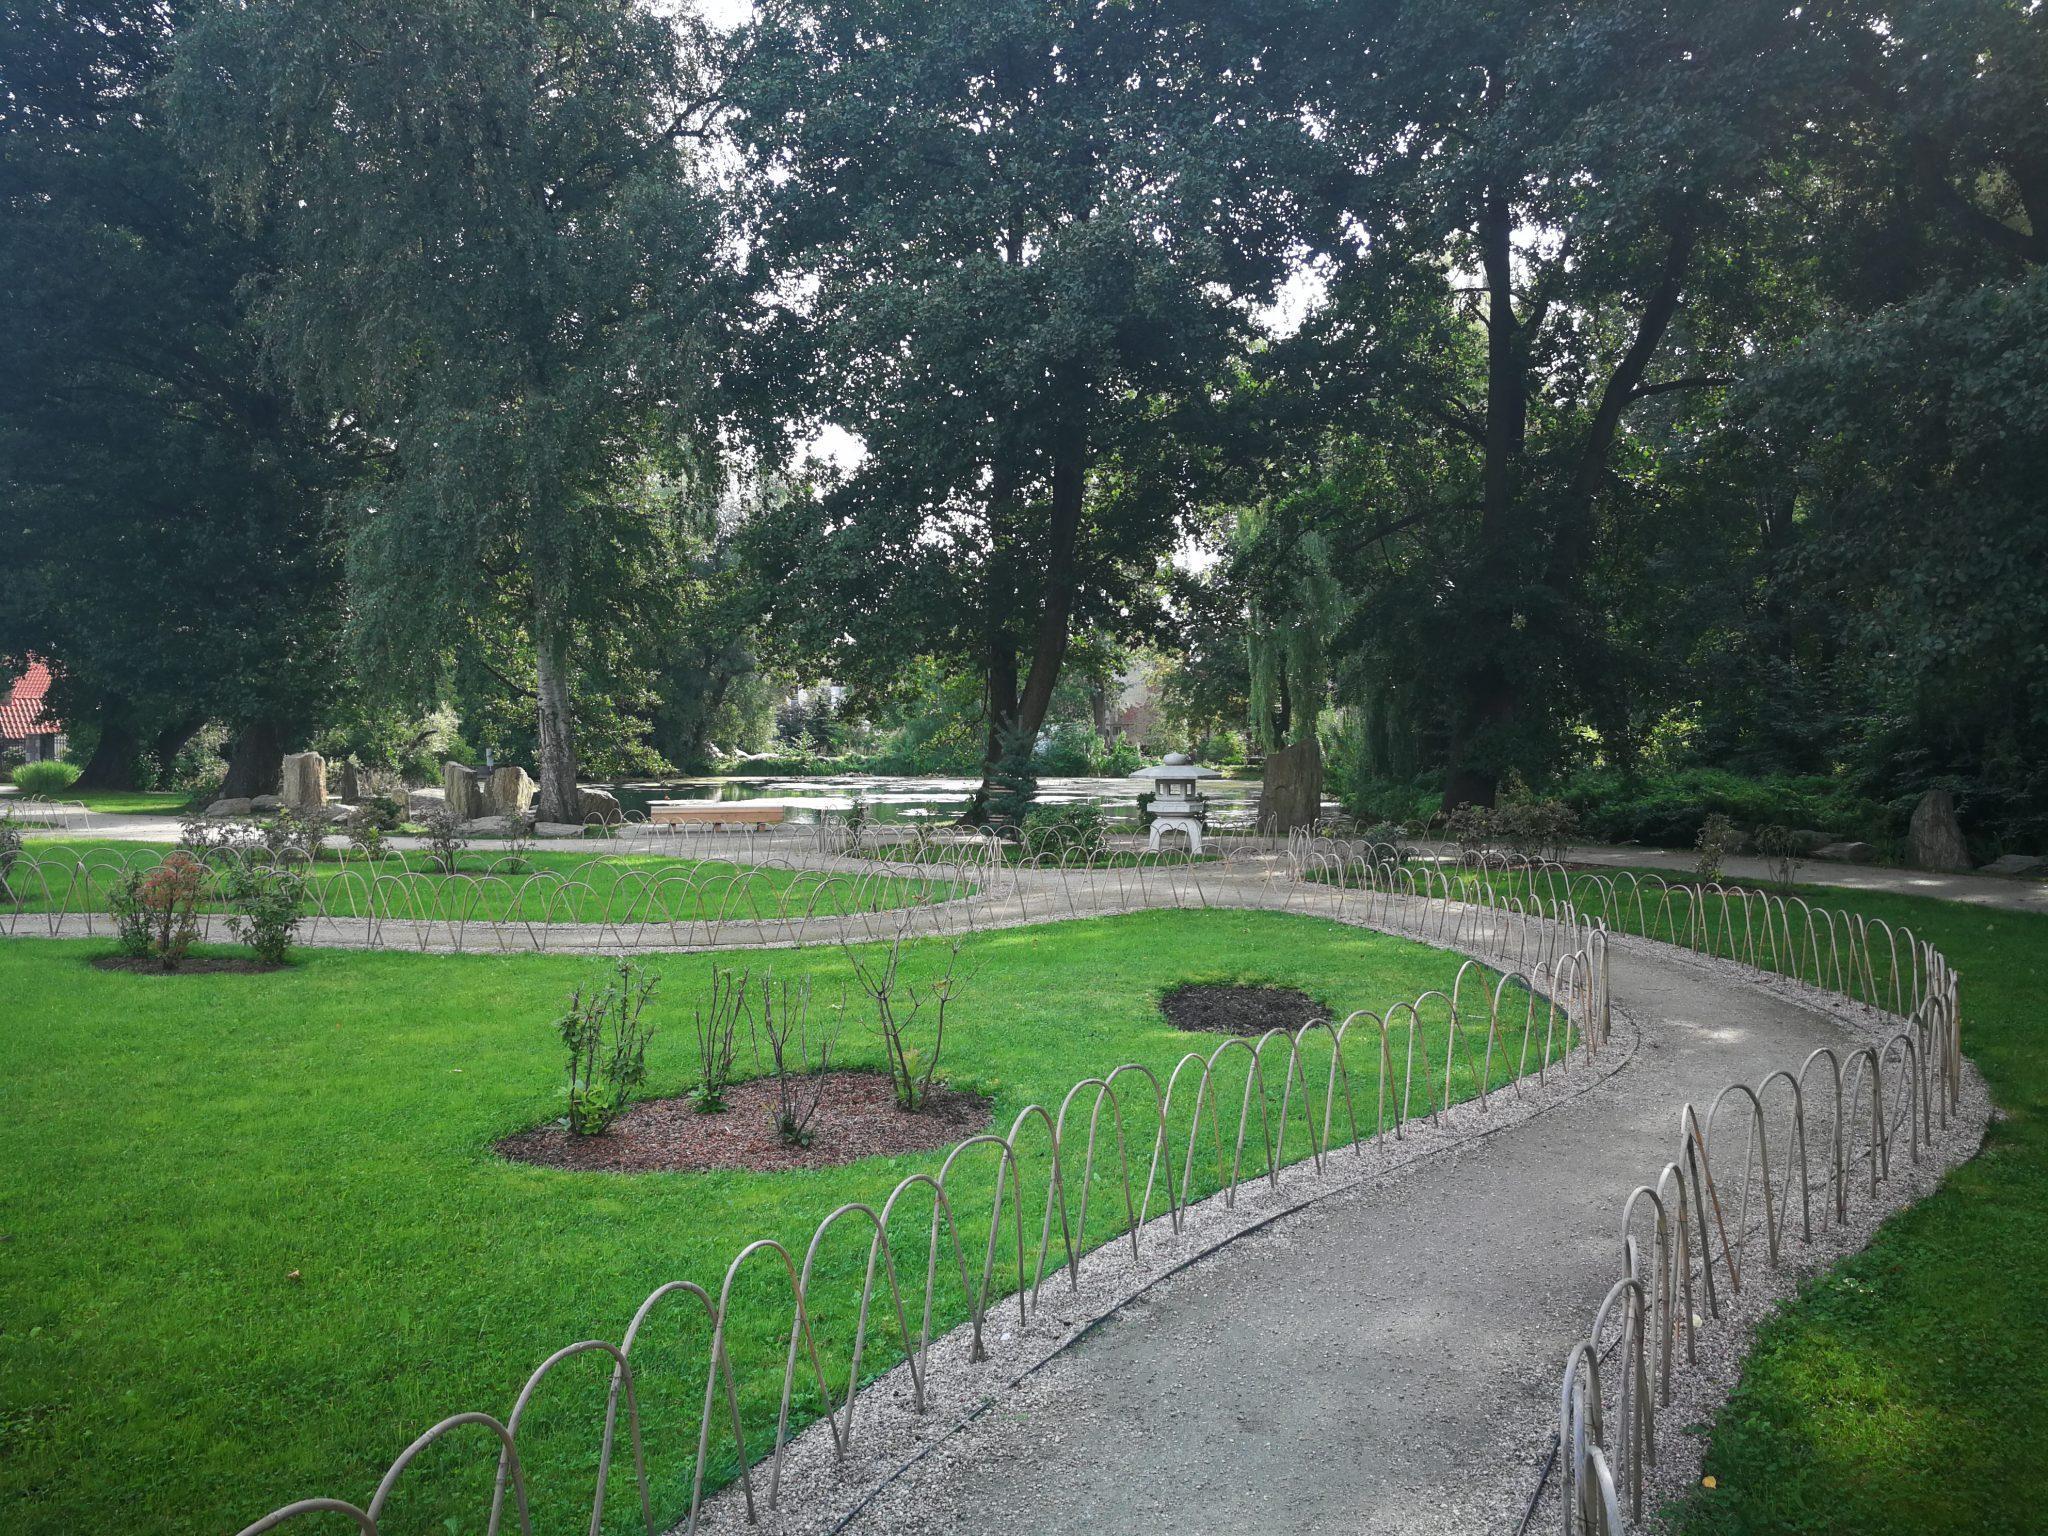 Ogród-Japoński-w-Parku-Oliwskim-w-Gdańsku-autor-Ania-Anna-Kotula-z-Tour-Guide-Service-Gdańsk